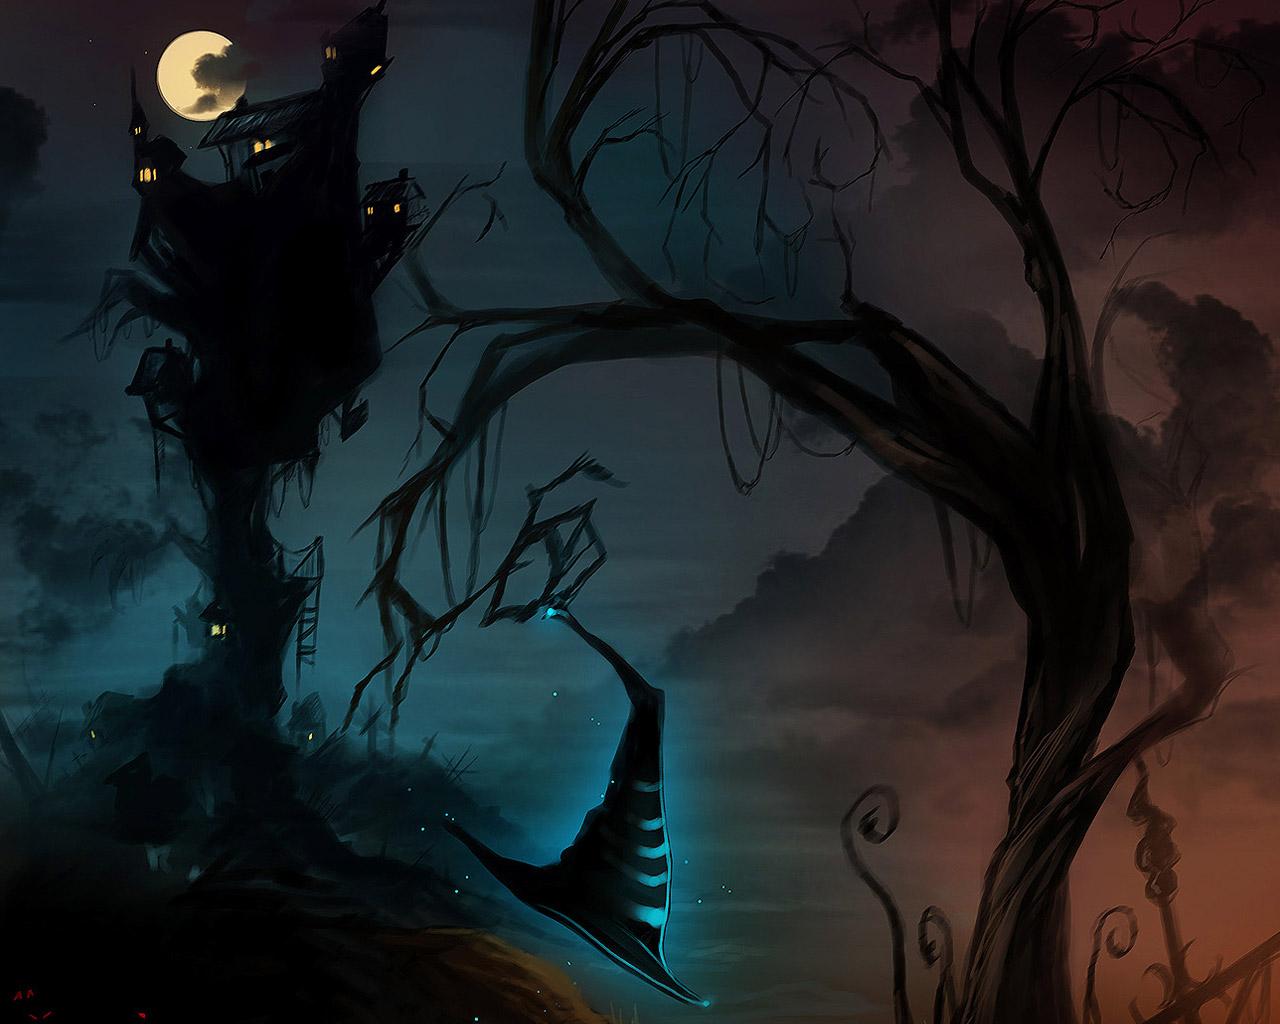 Halloween 2014 Wallpaper Scary Halloween Backgrounds Wallpaper 1280x1024